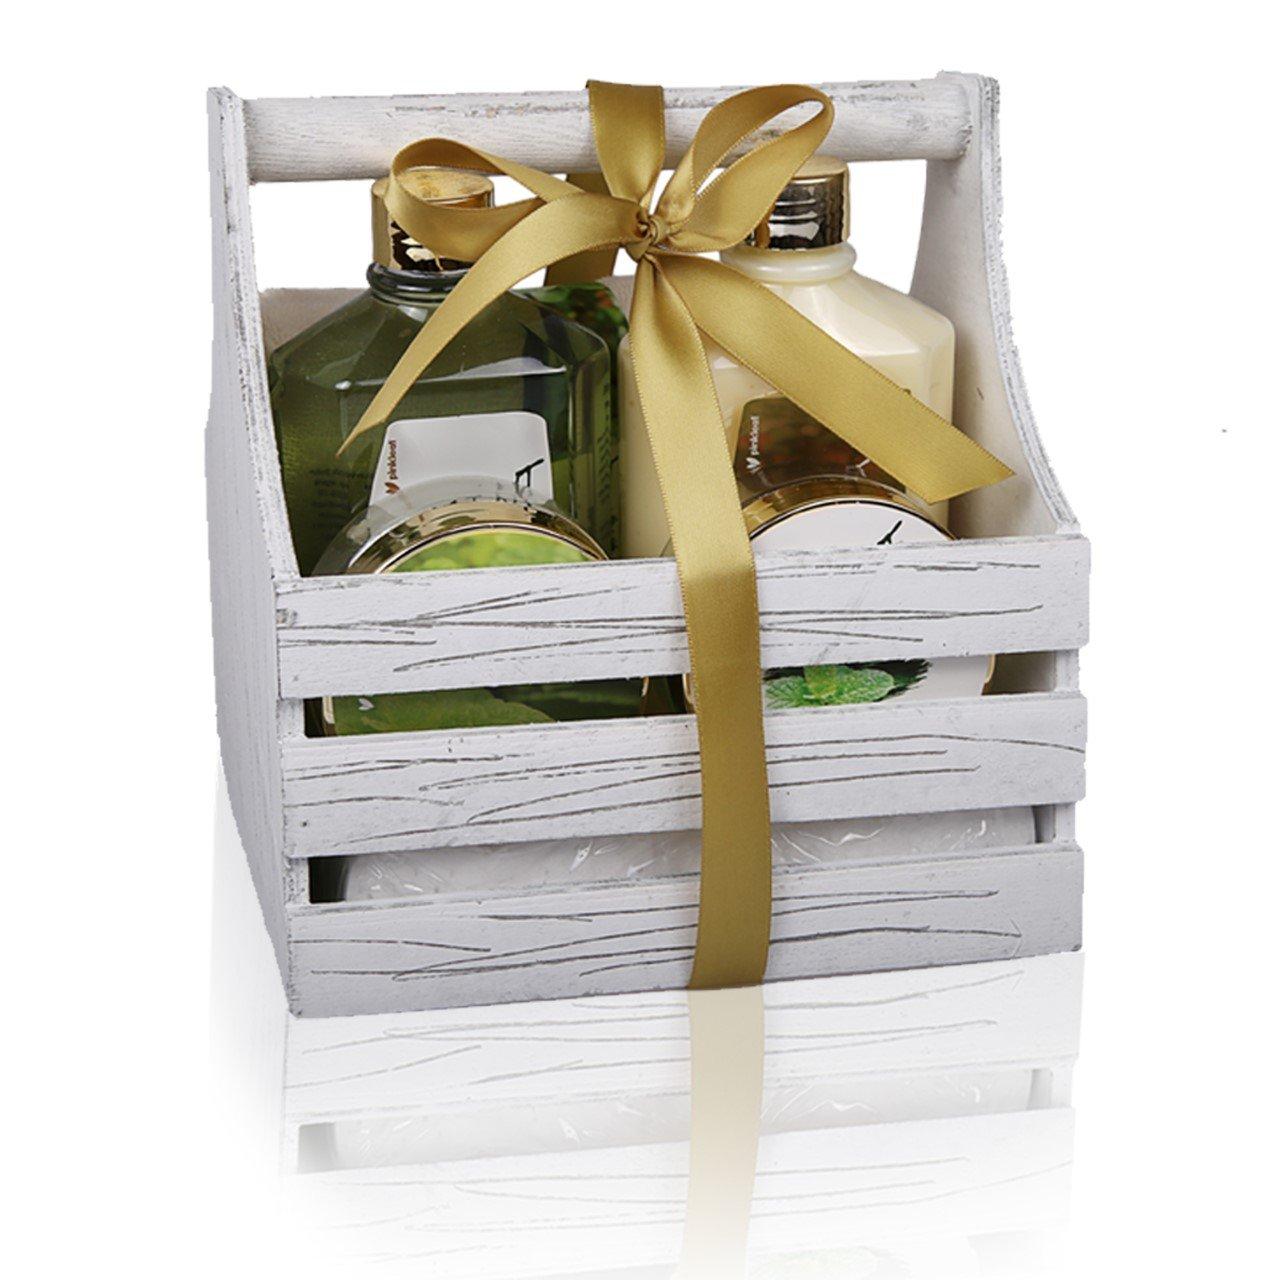 Amazon.com : Peppermint Bath & Body Care Gift Set - 5pc Scented ...